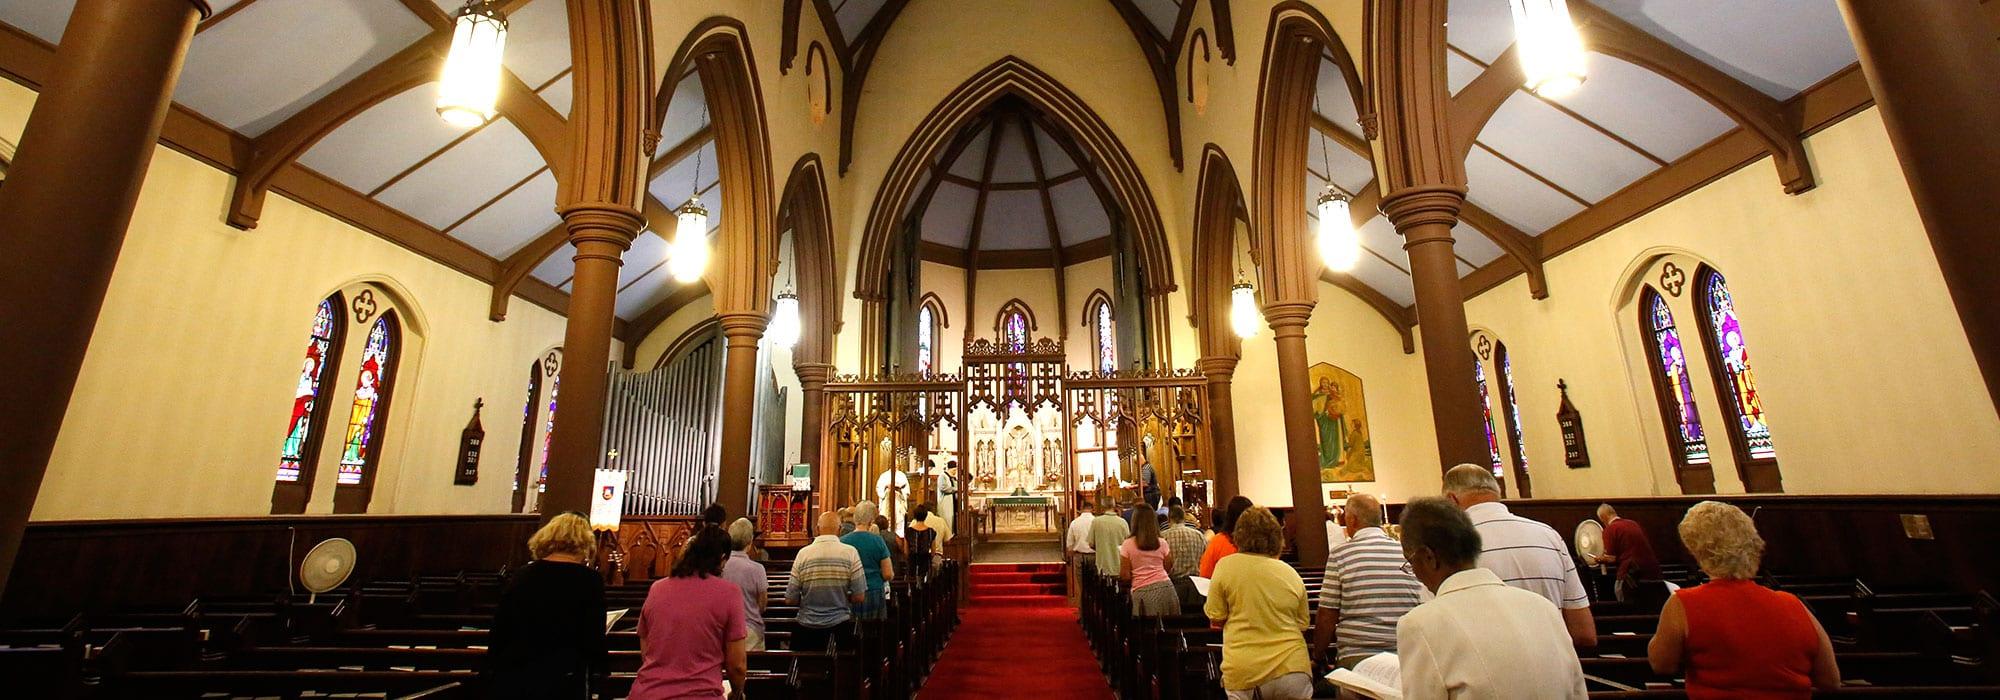 Inside of Church of St. Thomas